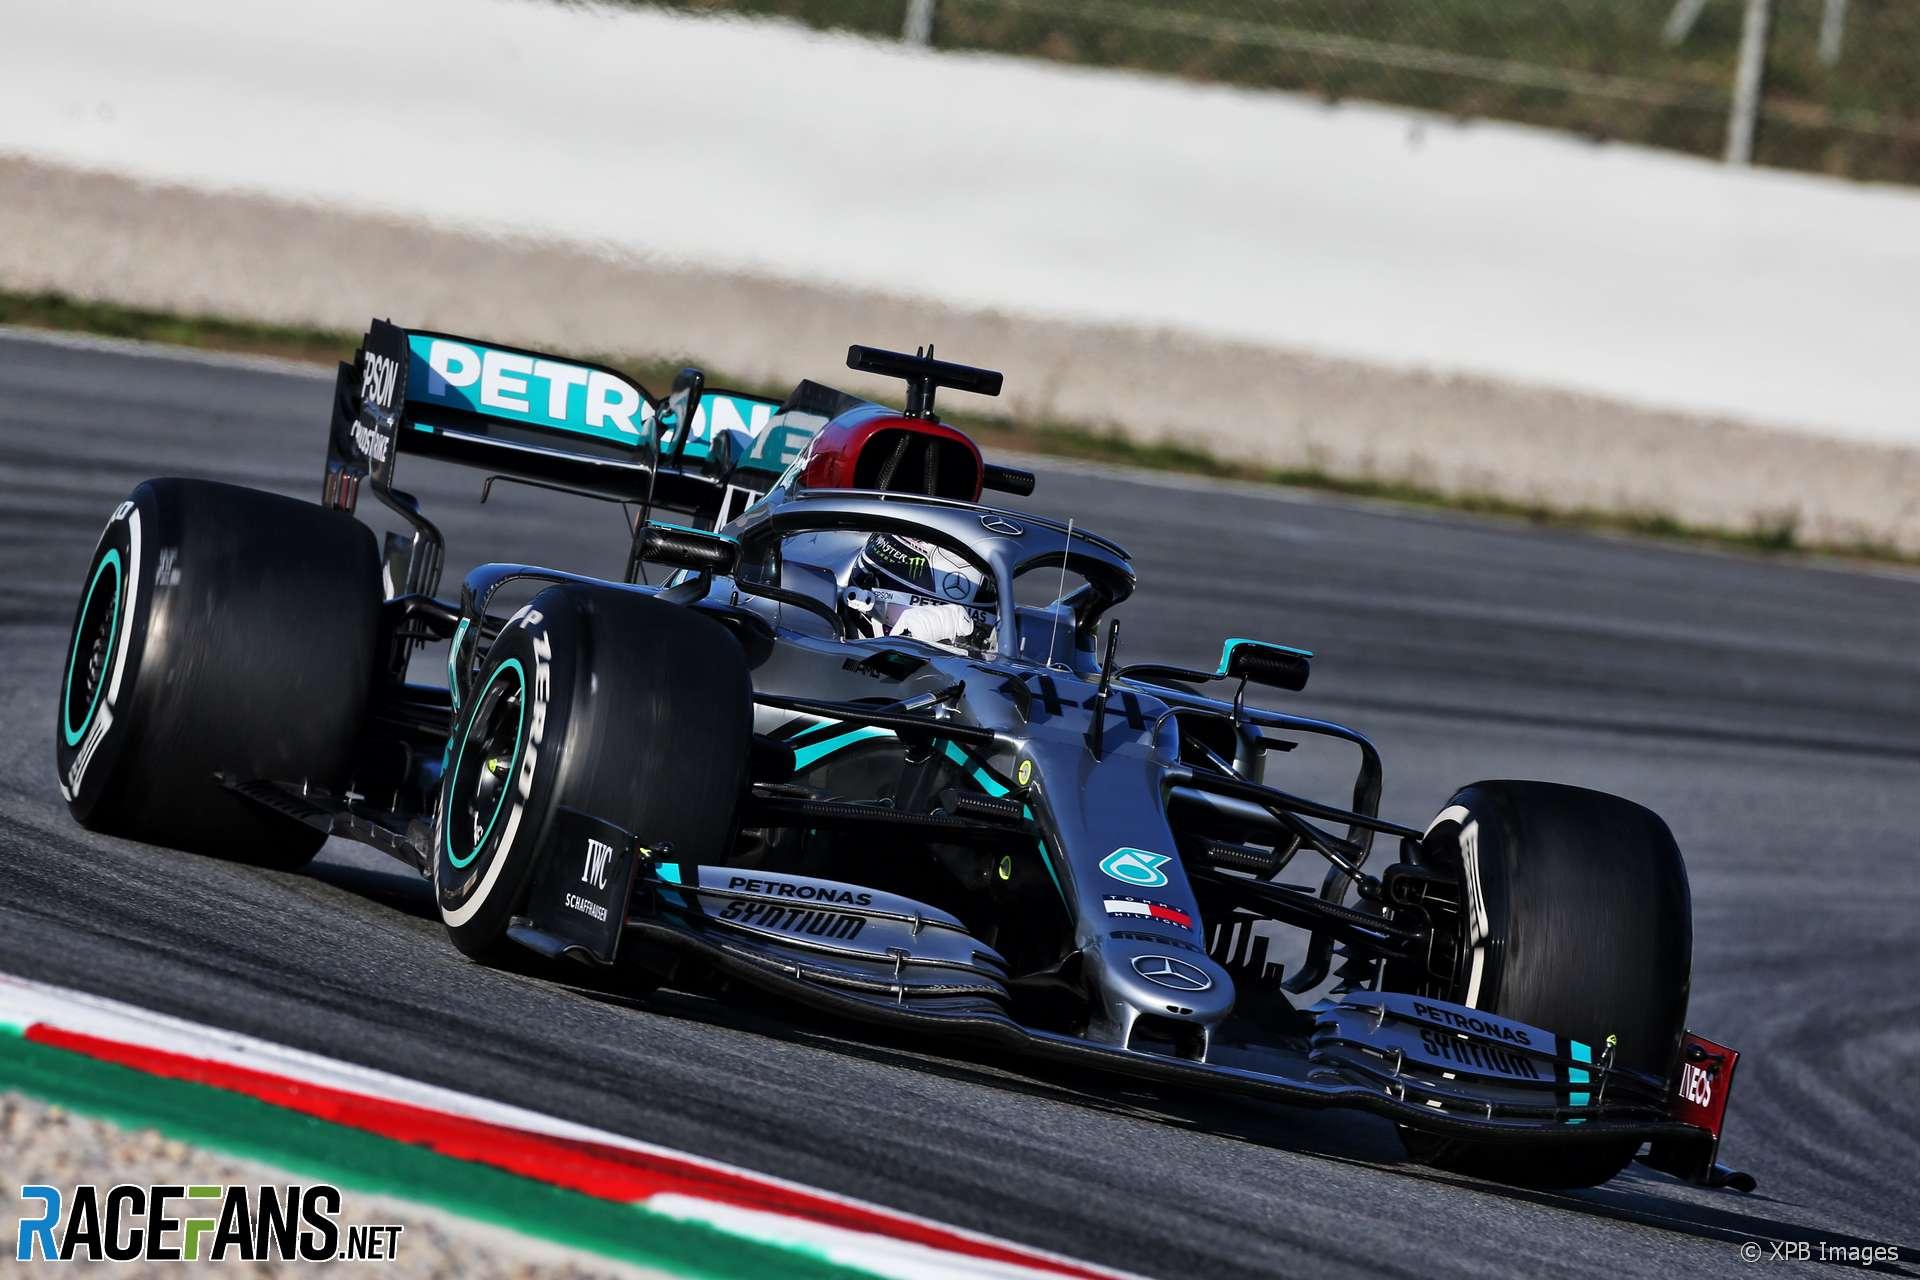 F1 Barcelona 2021